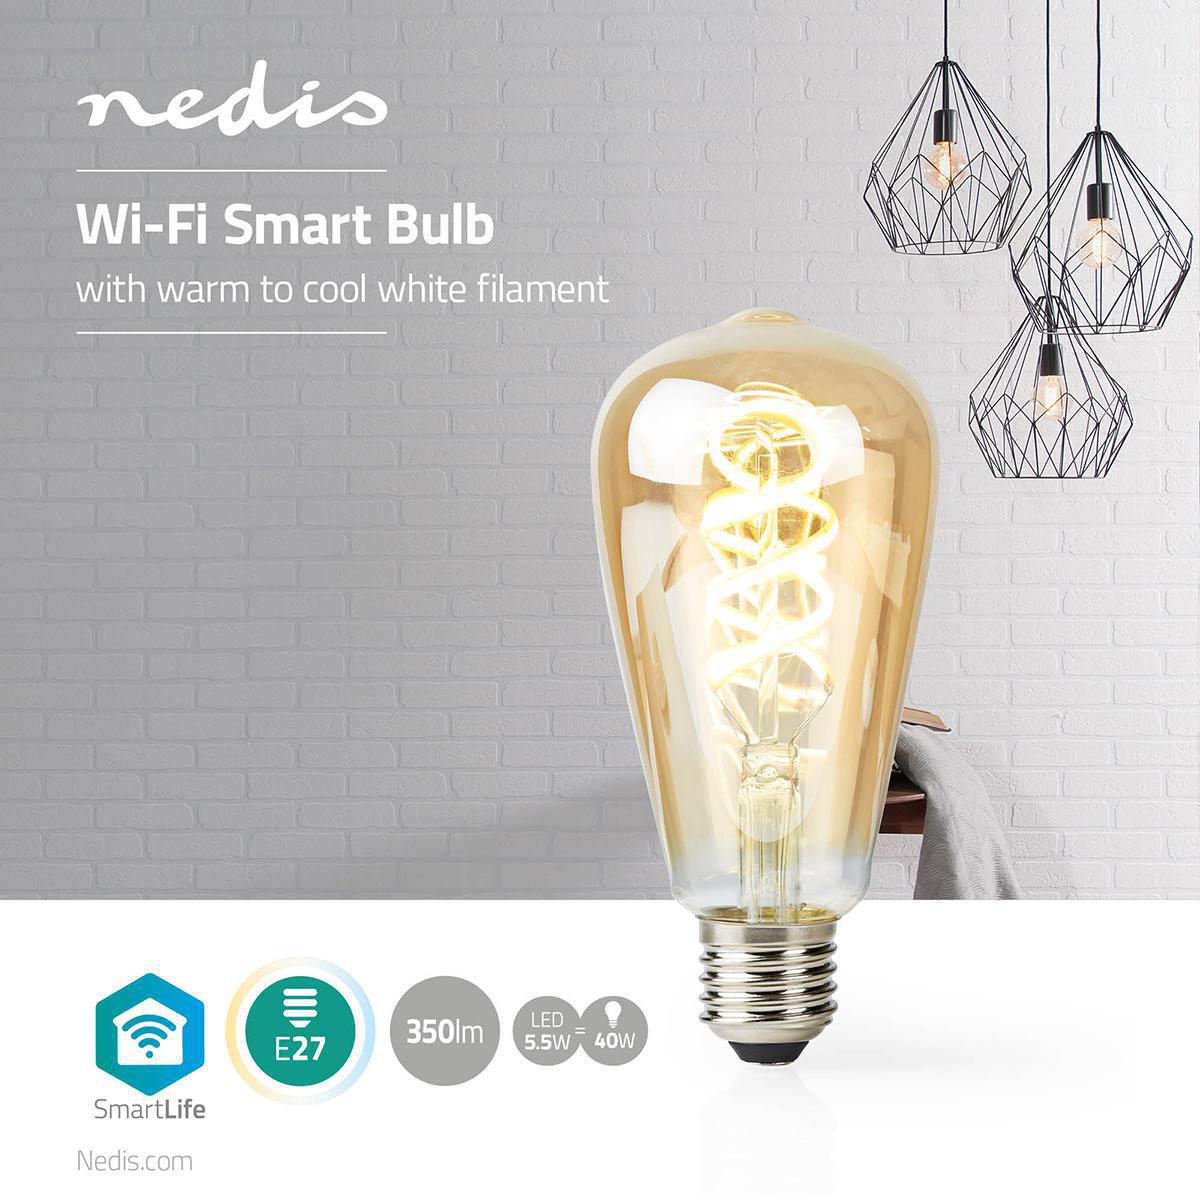 Slimme Led Edison Lamp met wifi E27 fitting 1800K - 6500K - sfeerfoto